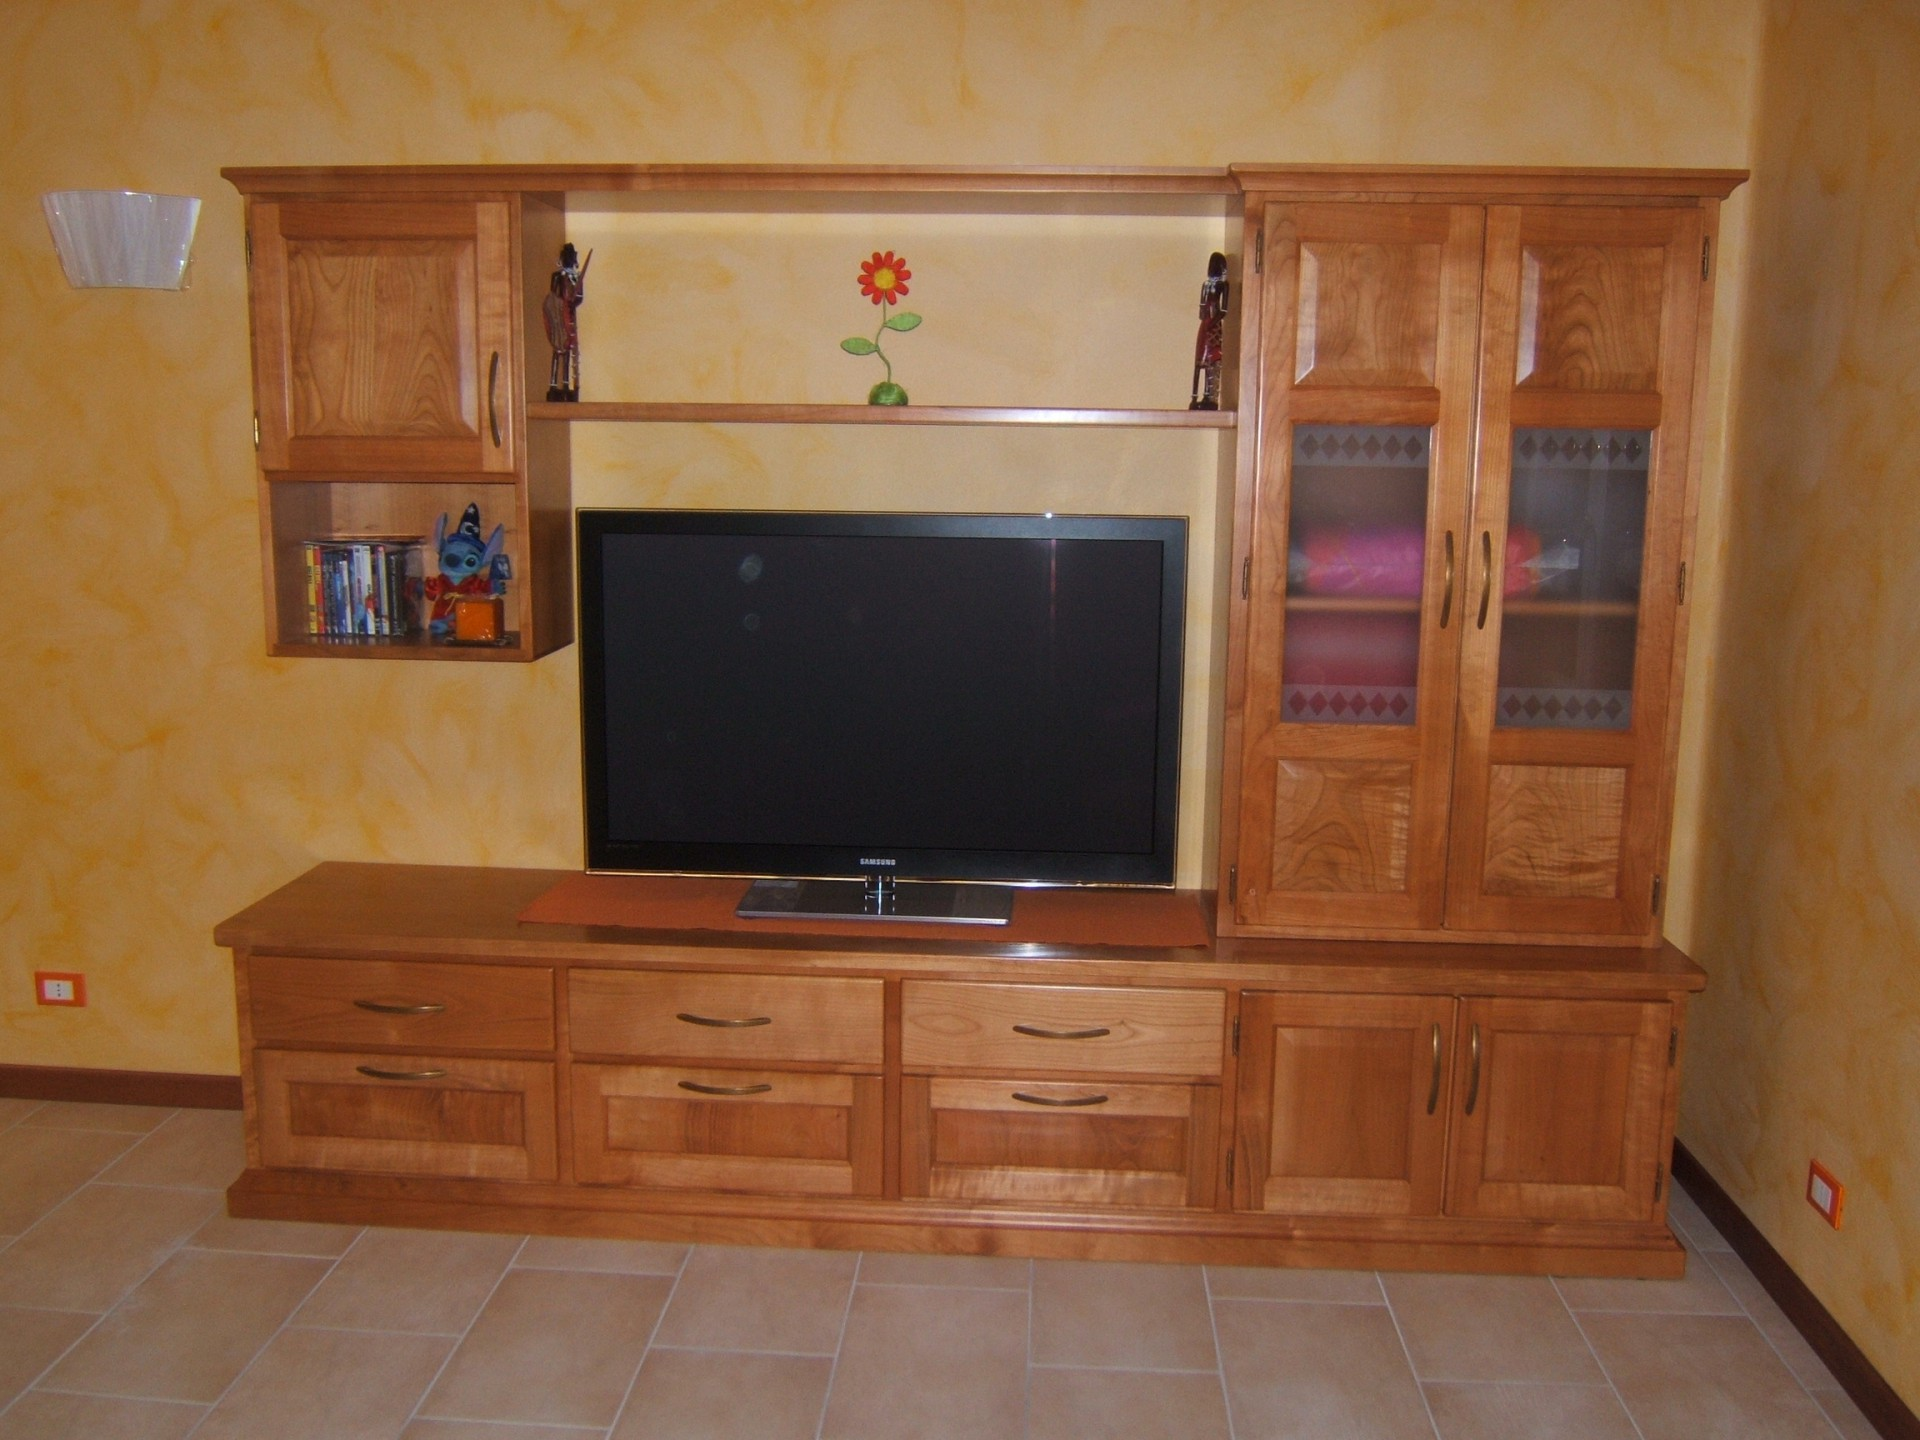 Cucine In Legno Di Ulivo ~ duylinh for